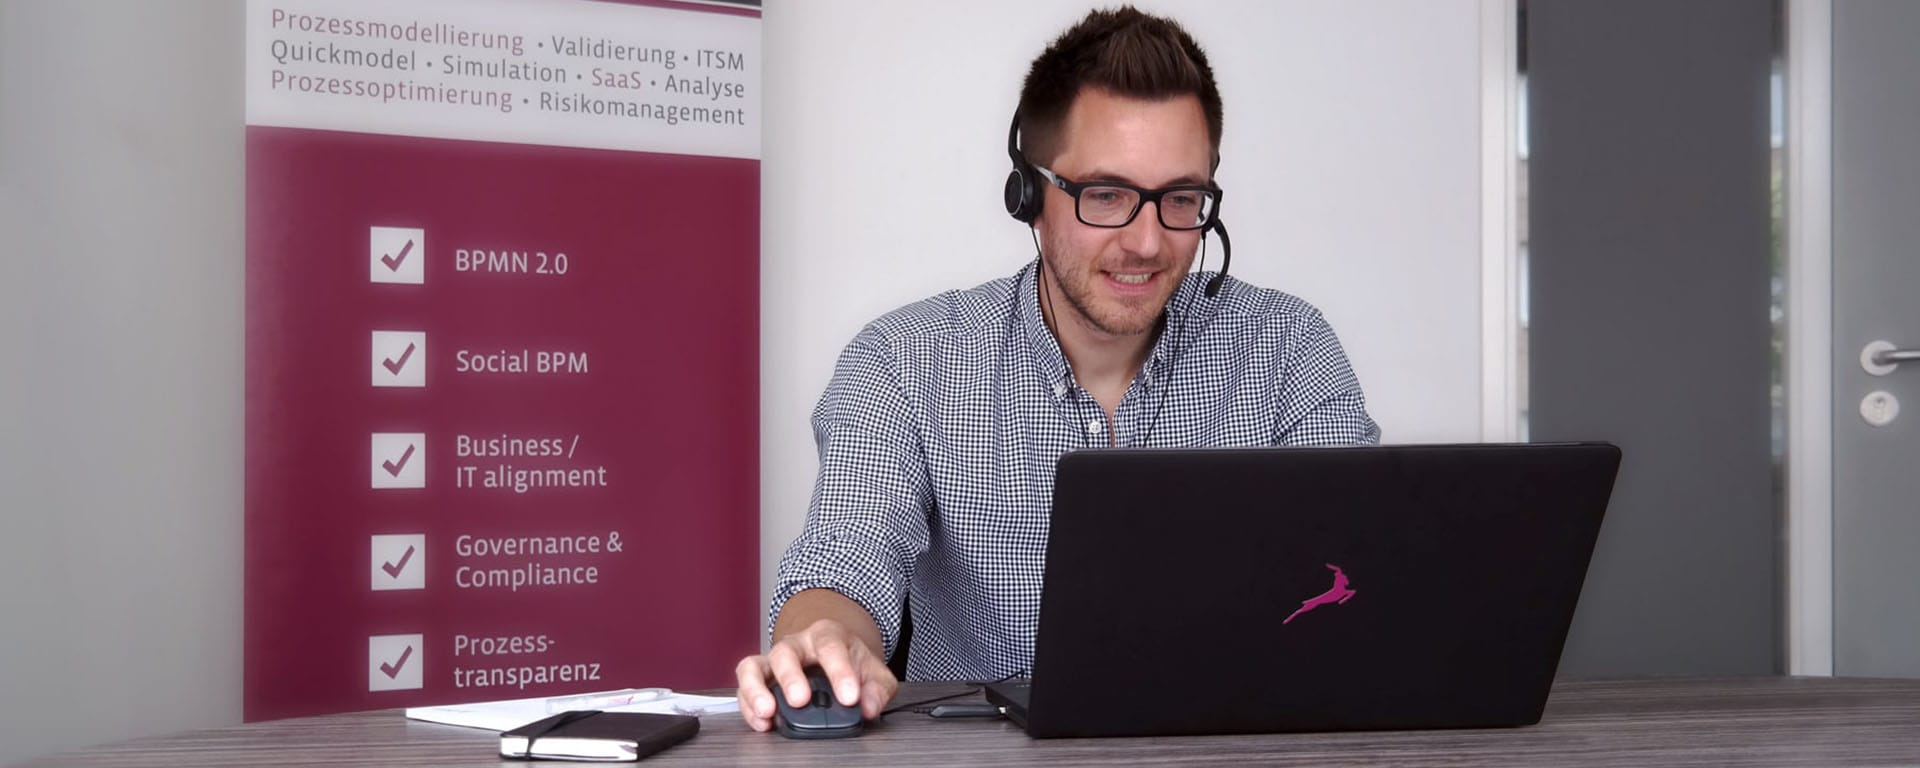 Webinar Expert at his Desk